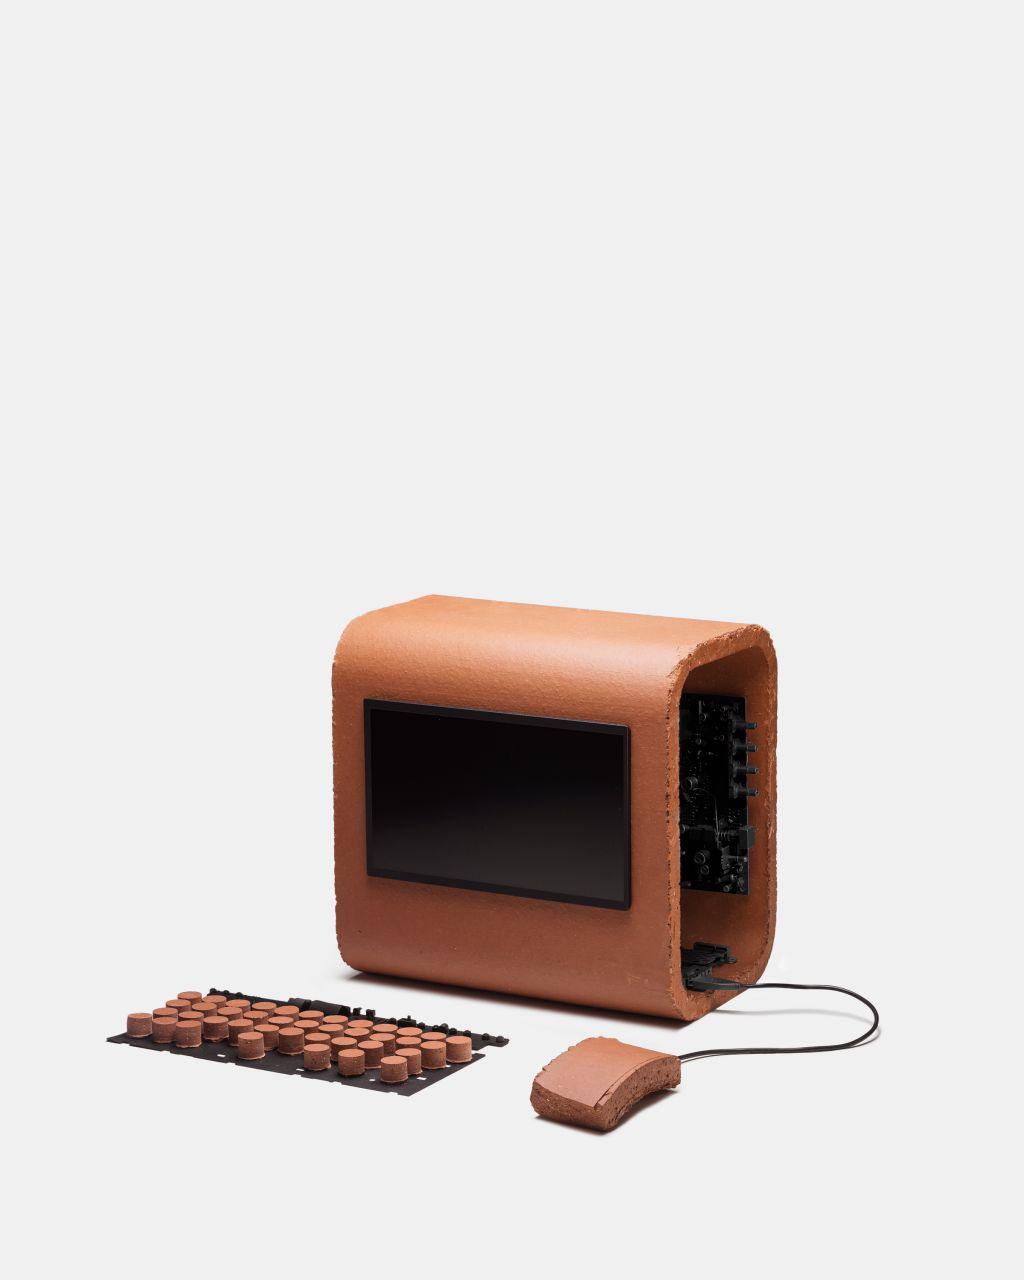 Компьютер из кирпича